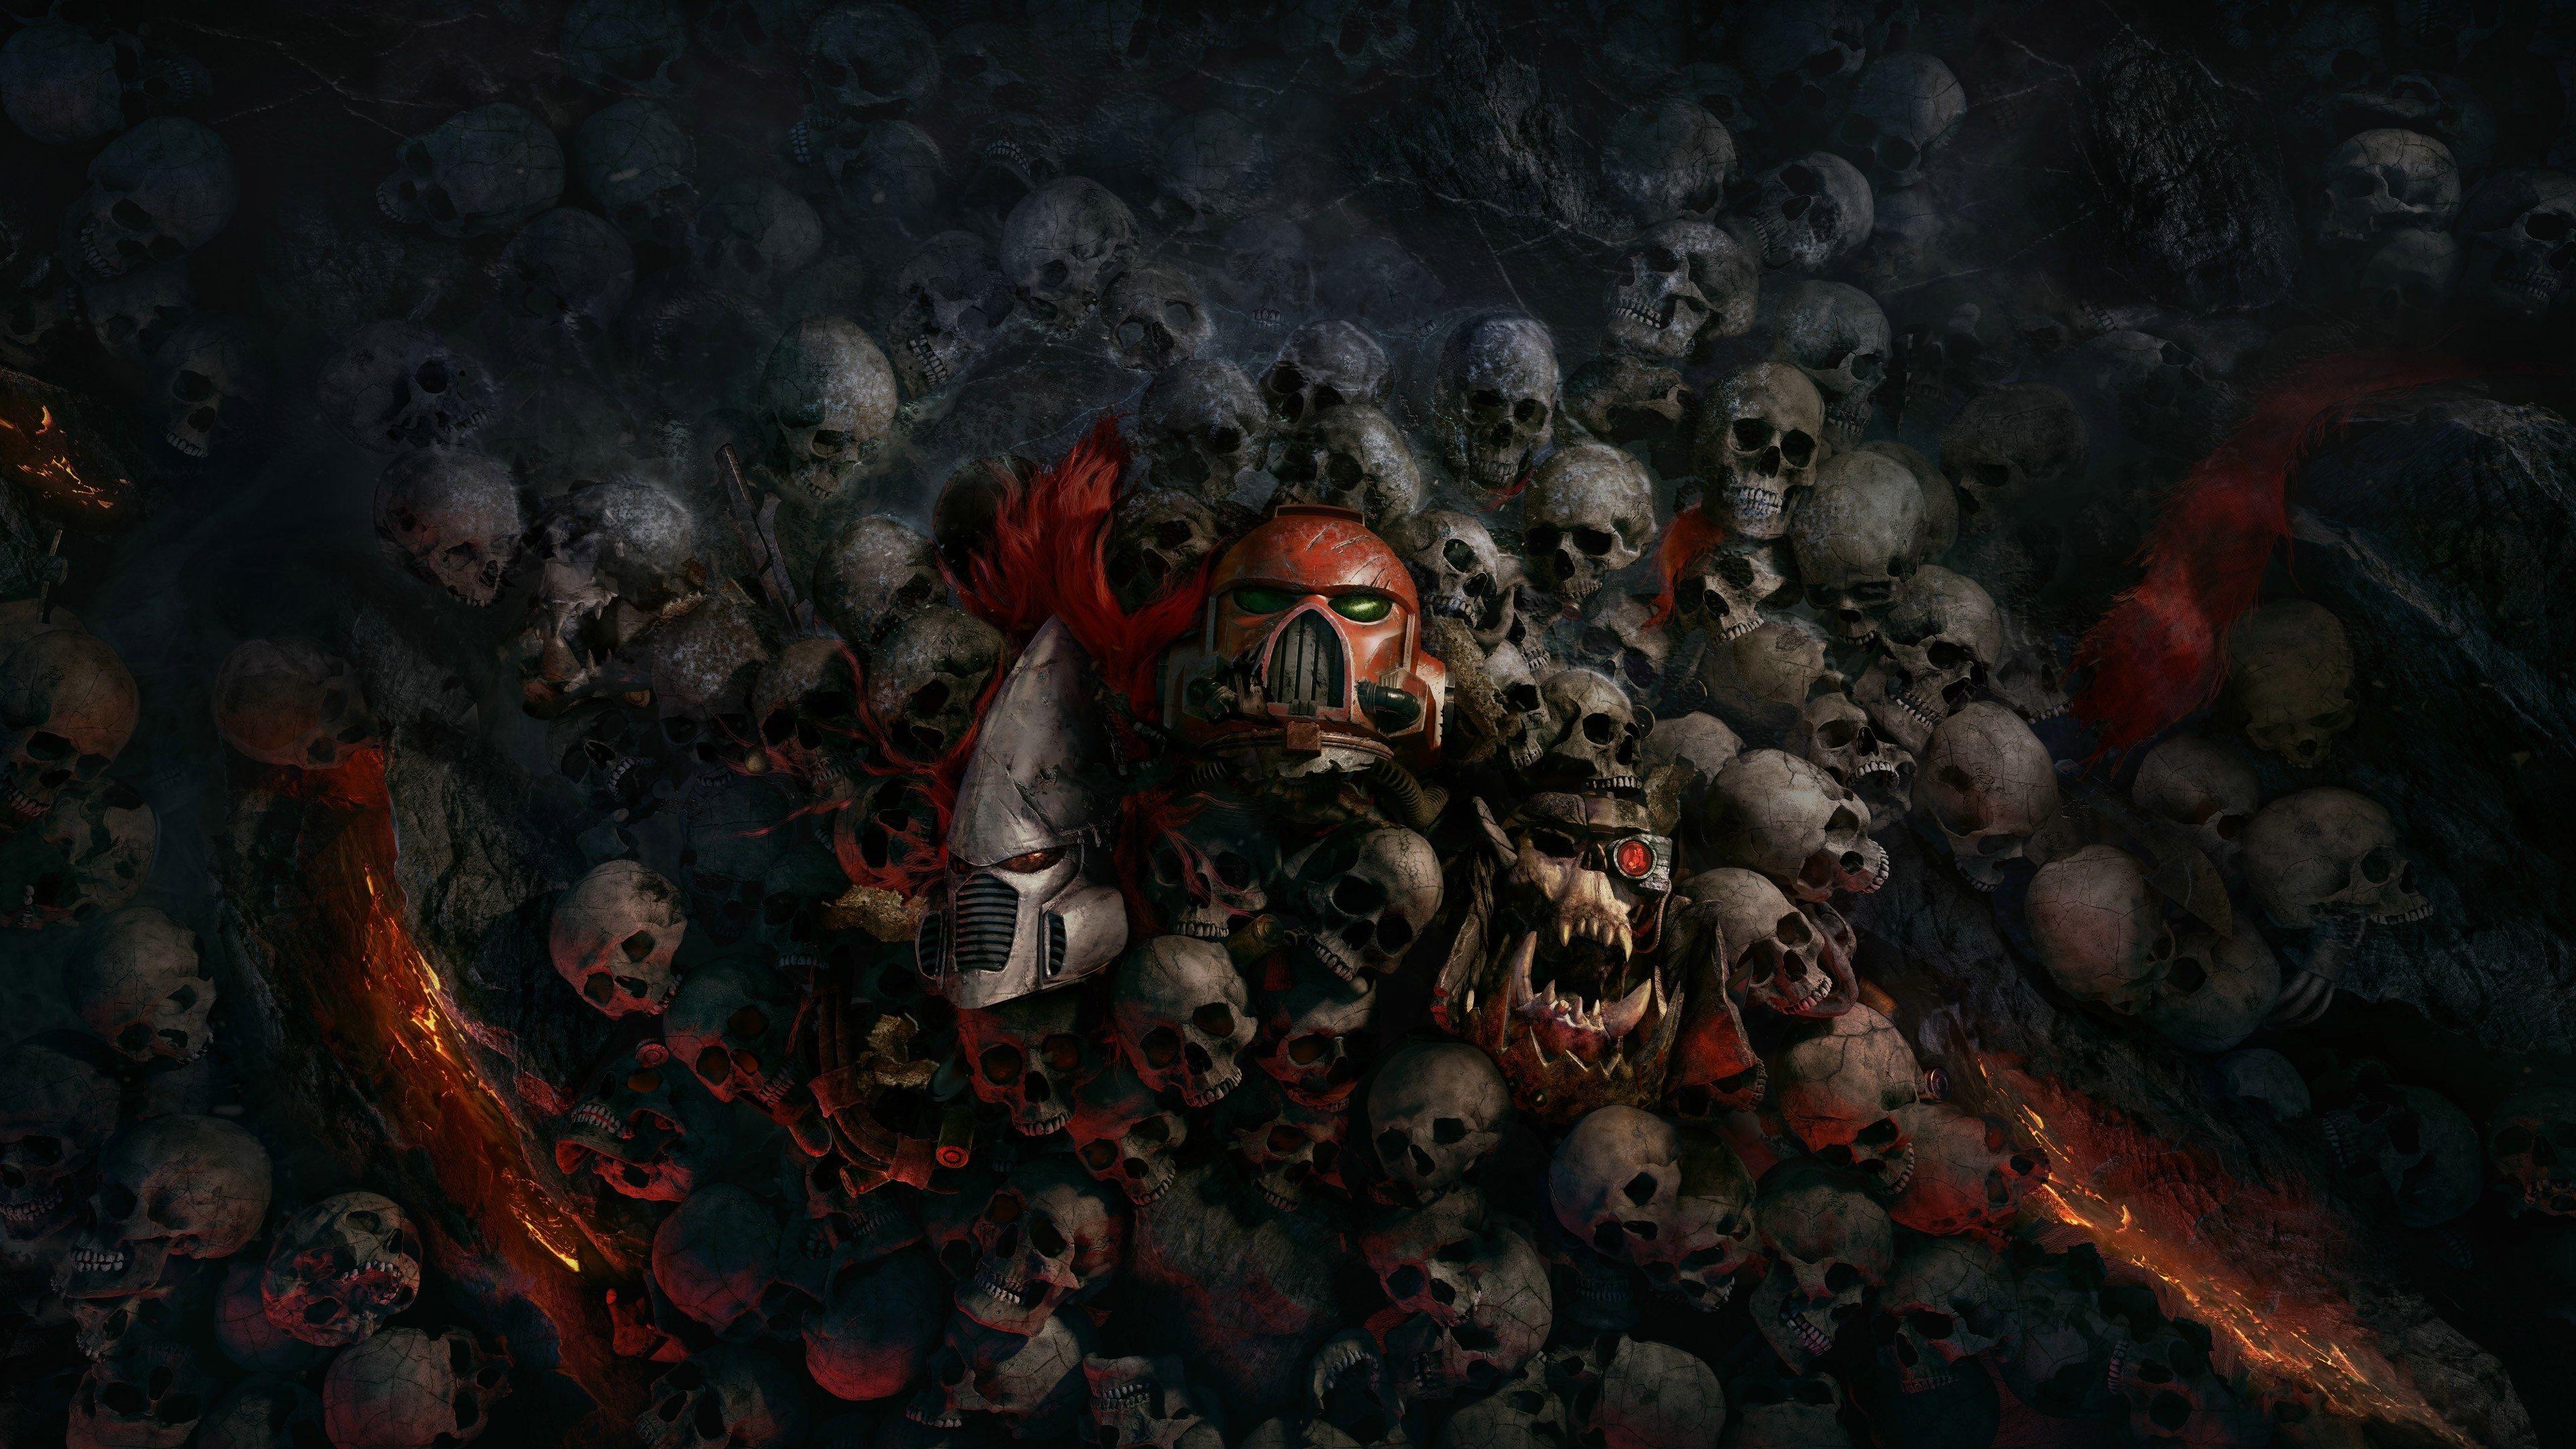 3840x2160 skull 4k wallpaper background desktop computer